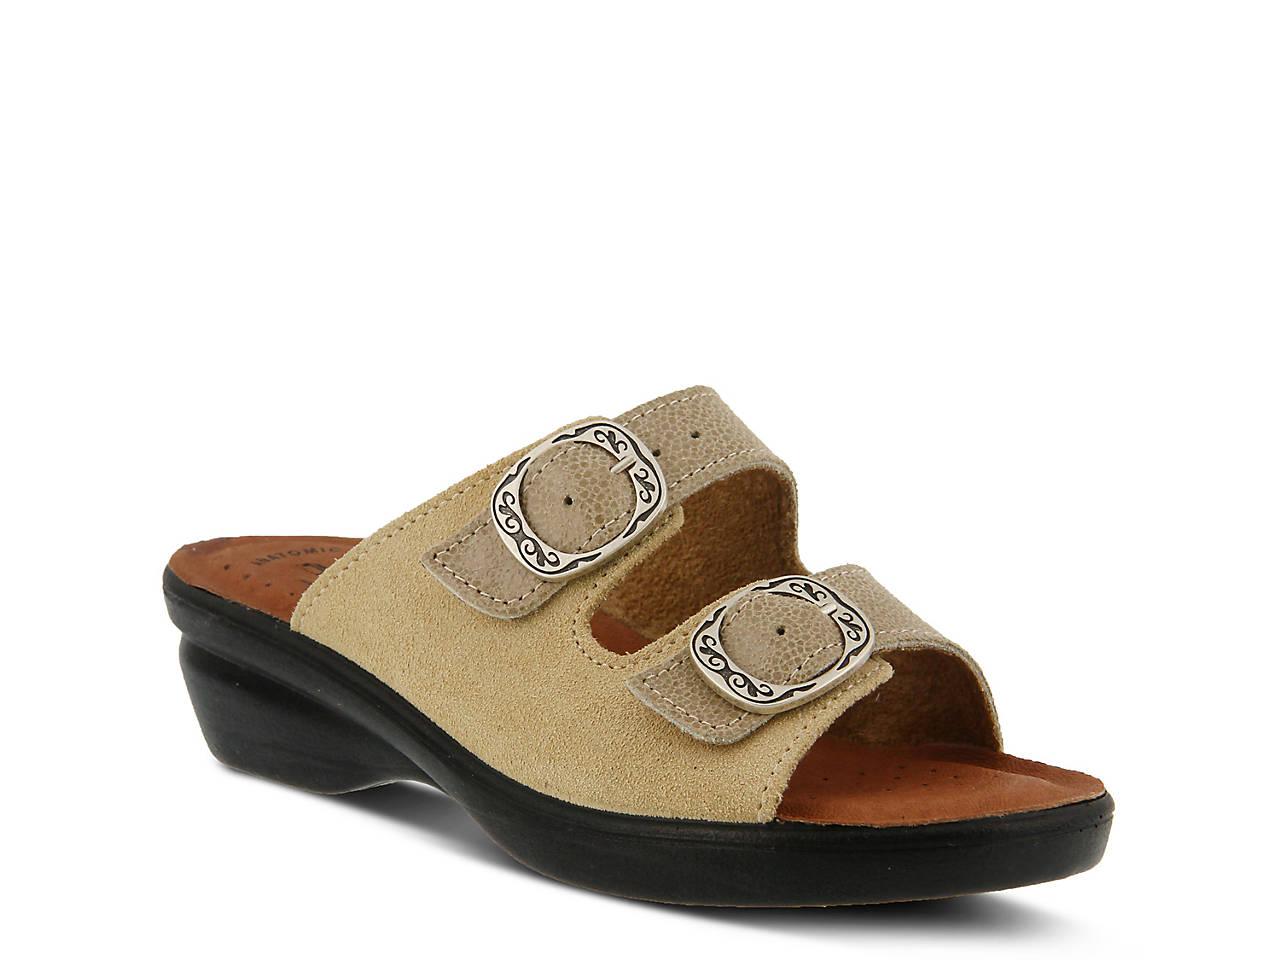 3844dc3b914d Flexus by Spring Step Coast Wedge Sandal Women s Shoes